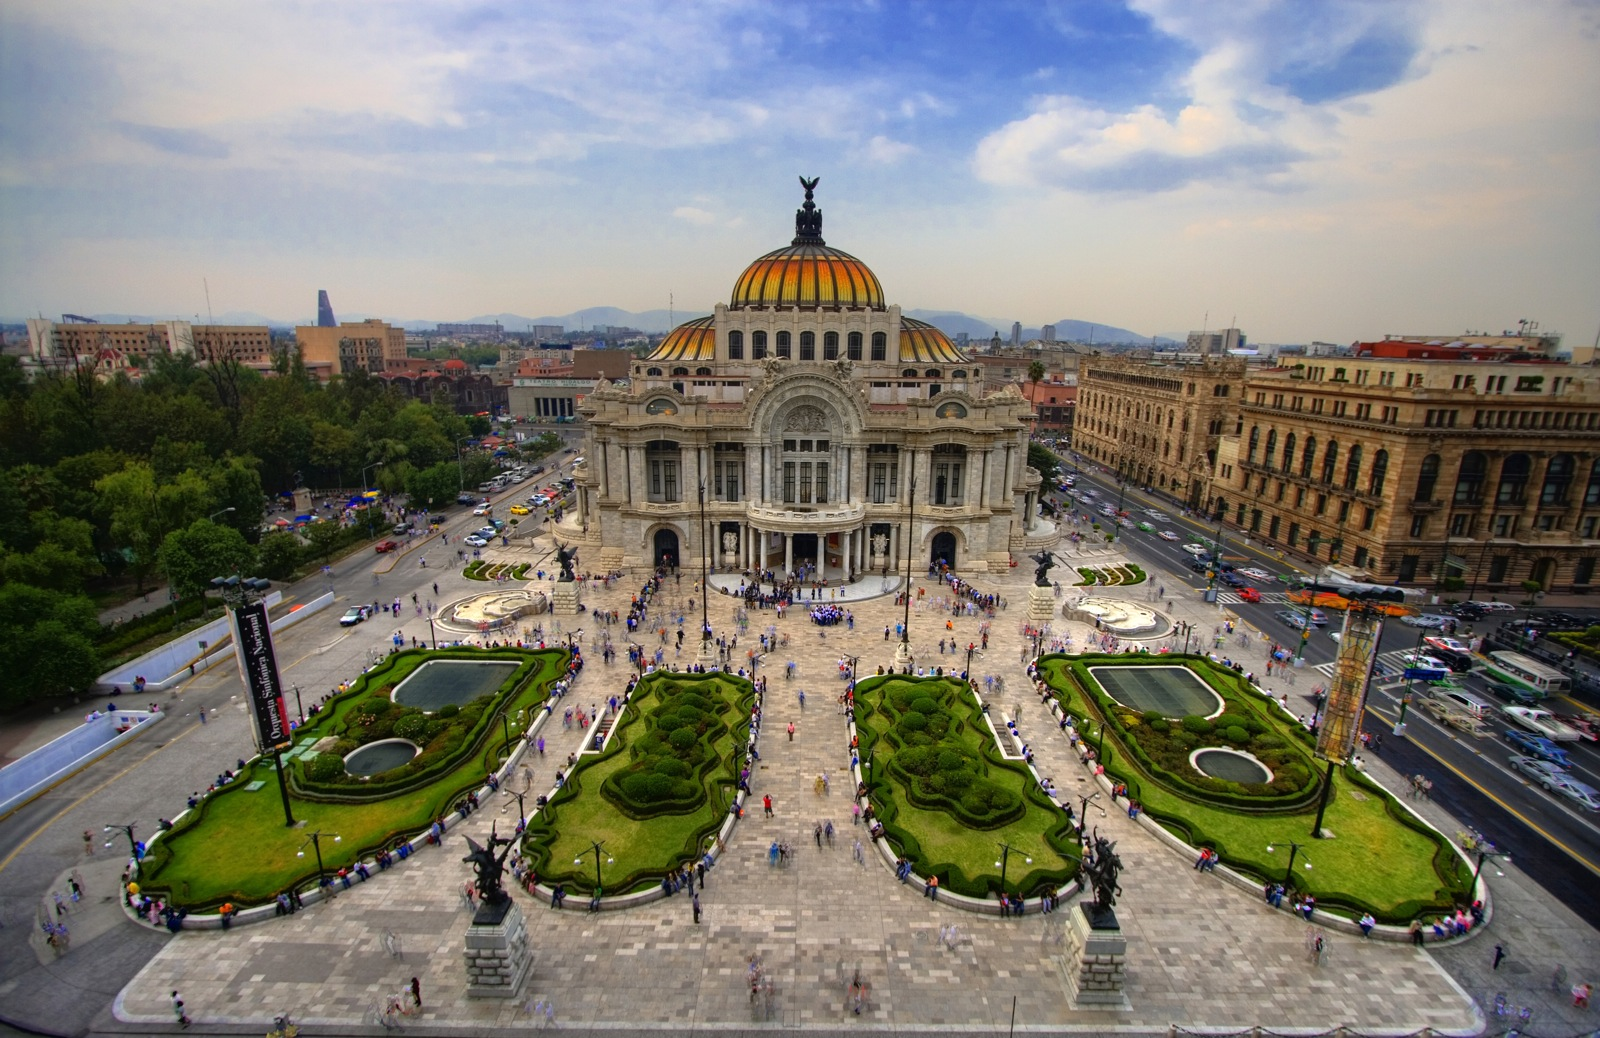 10. Mexico City